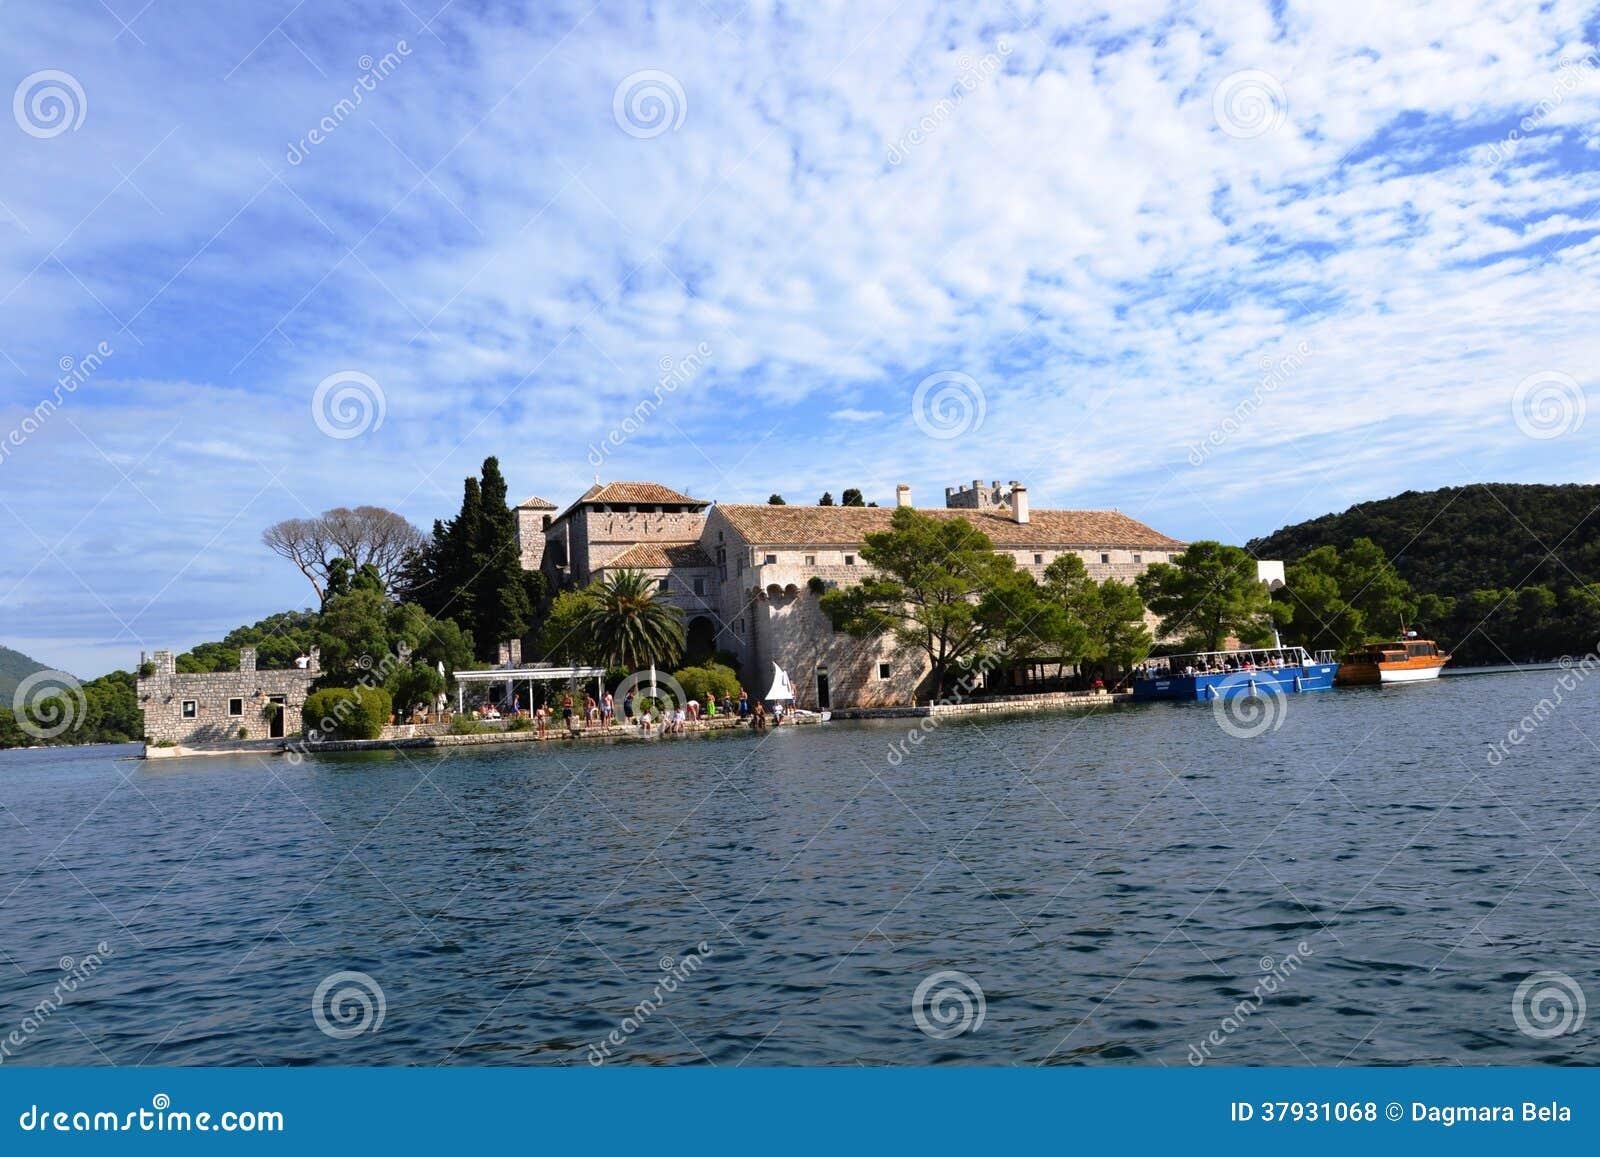 Бенедиктинский монастырь St Mary на острове Mljet